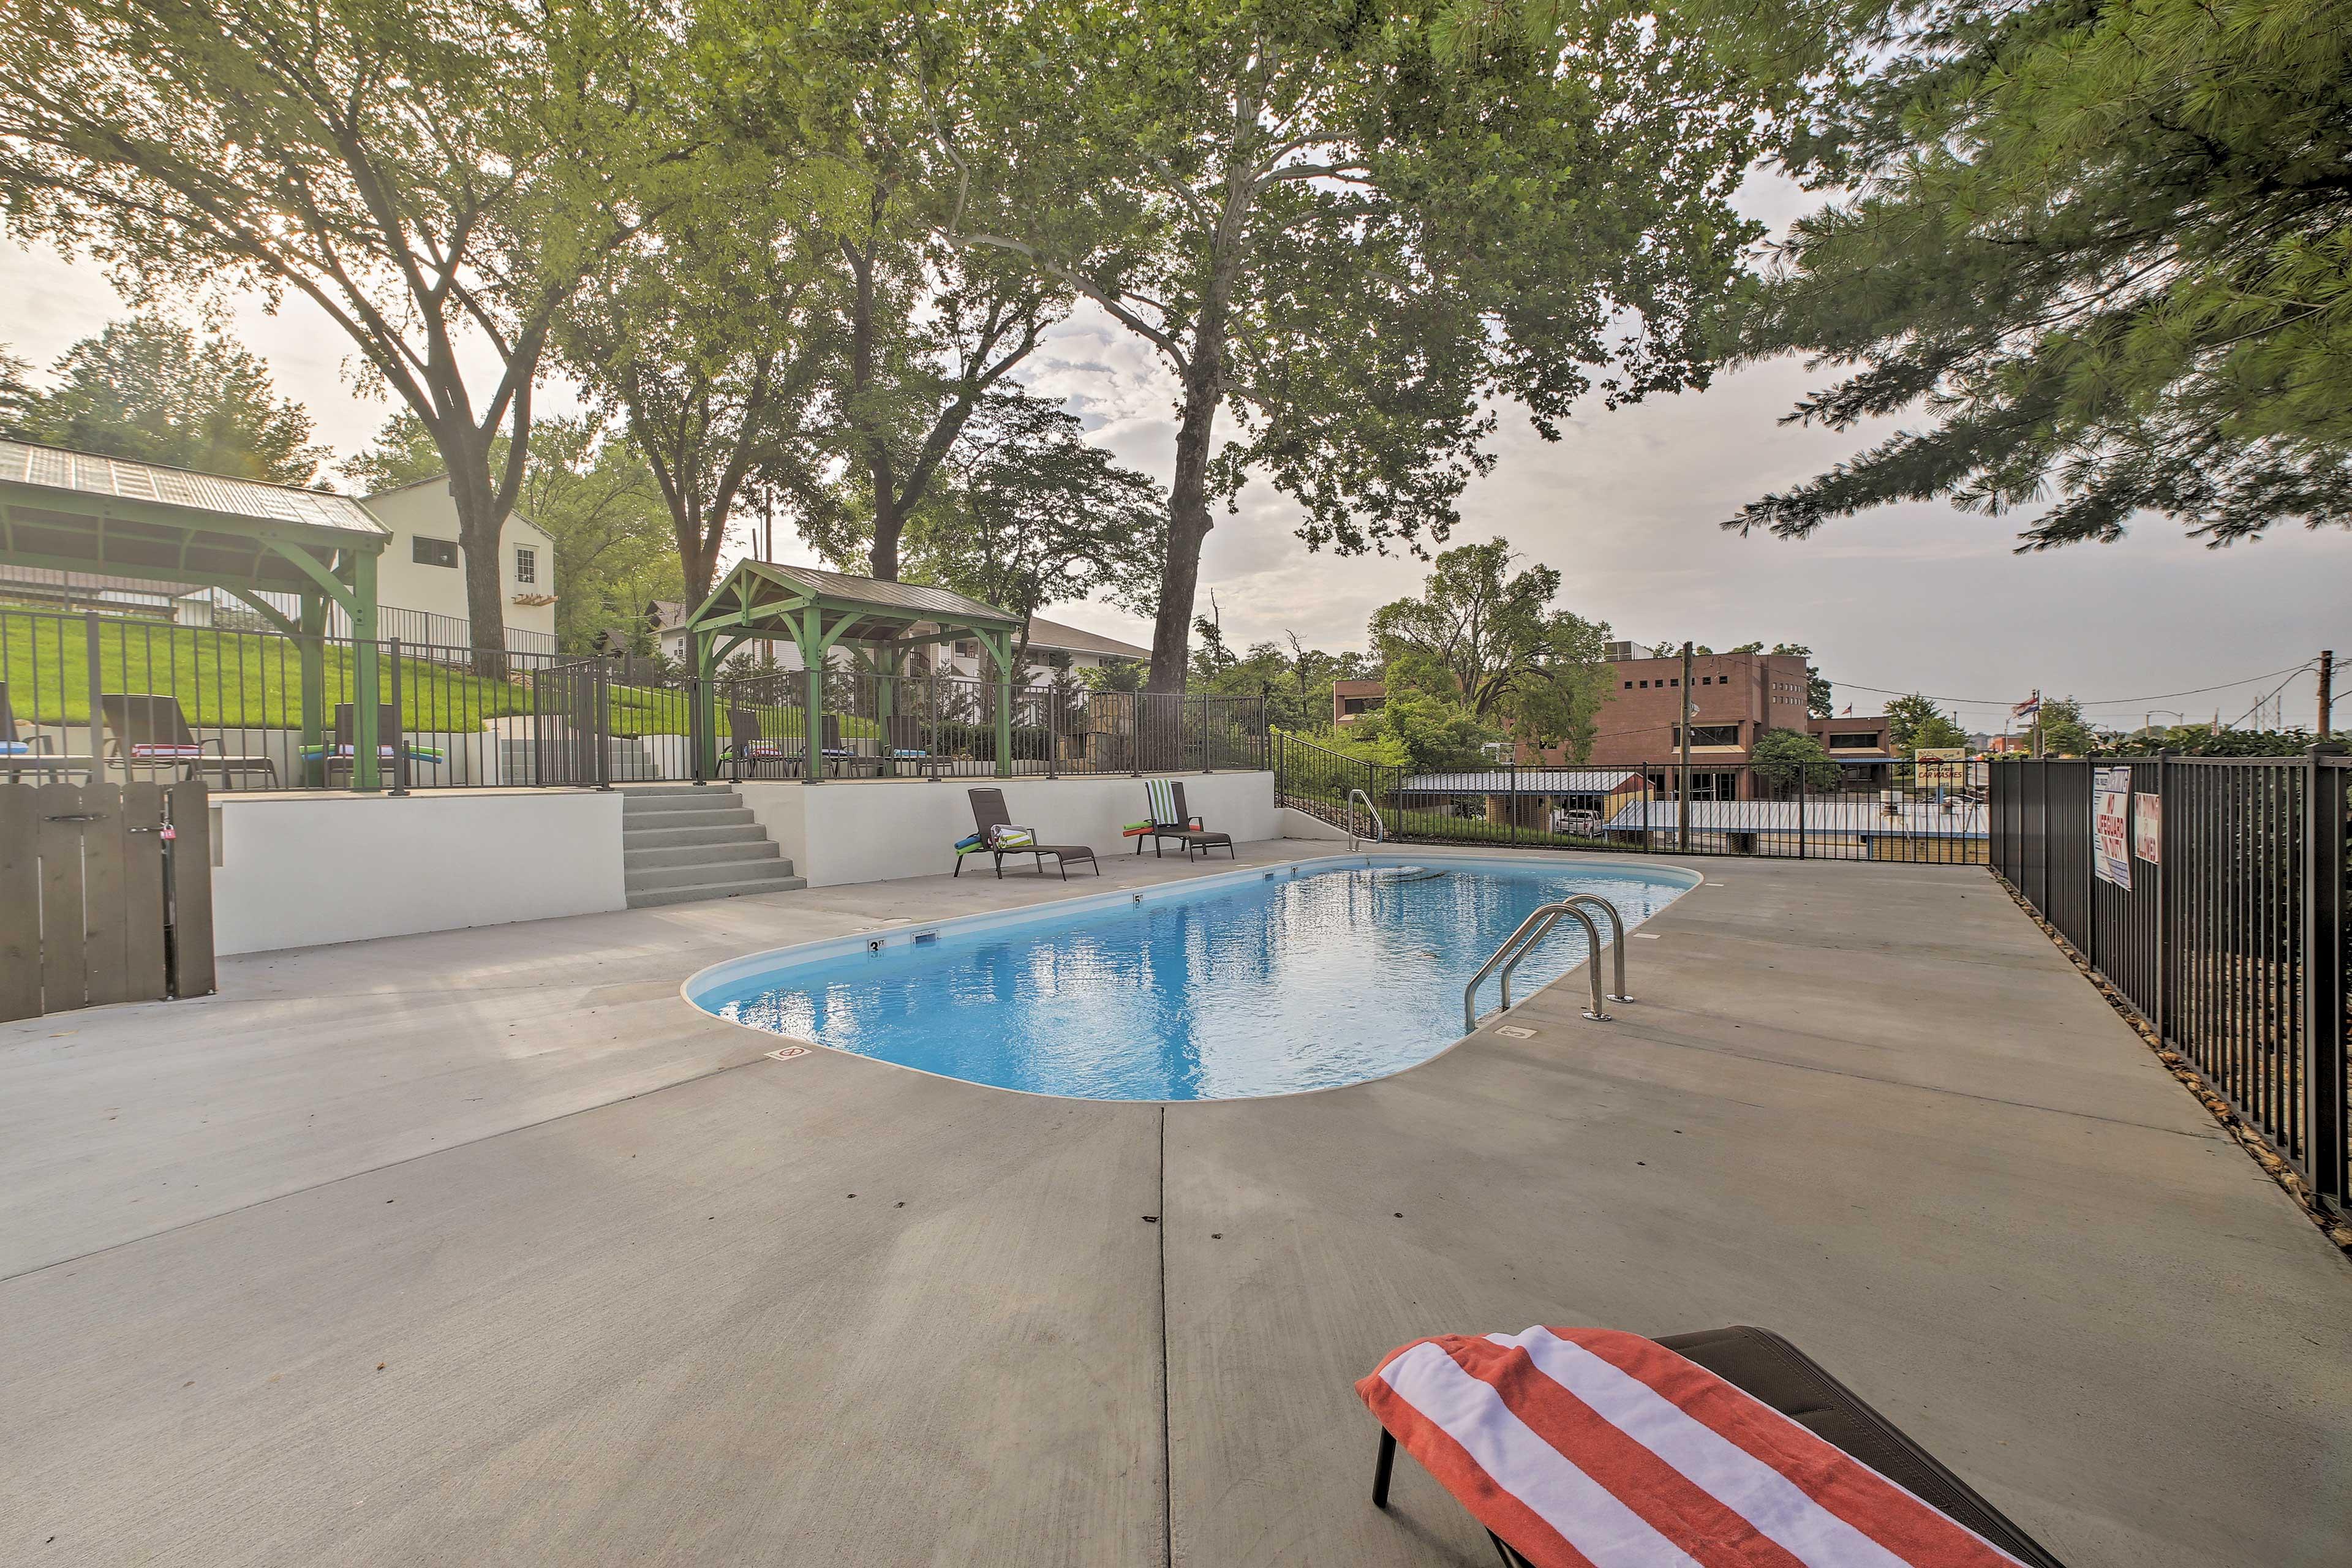 Make a splash in the community pool.